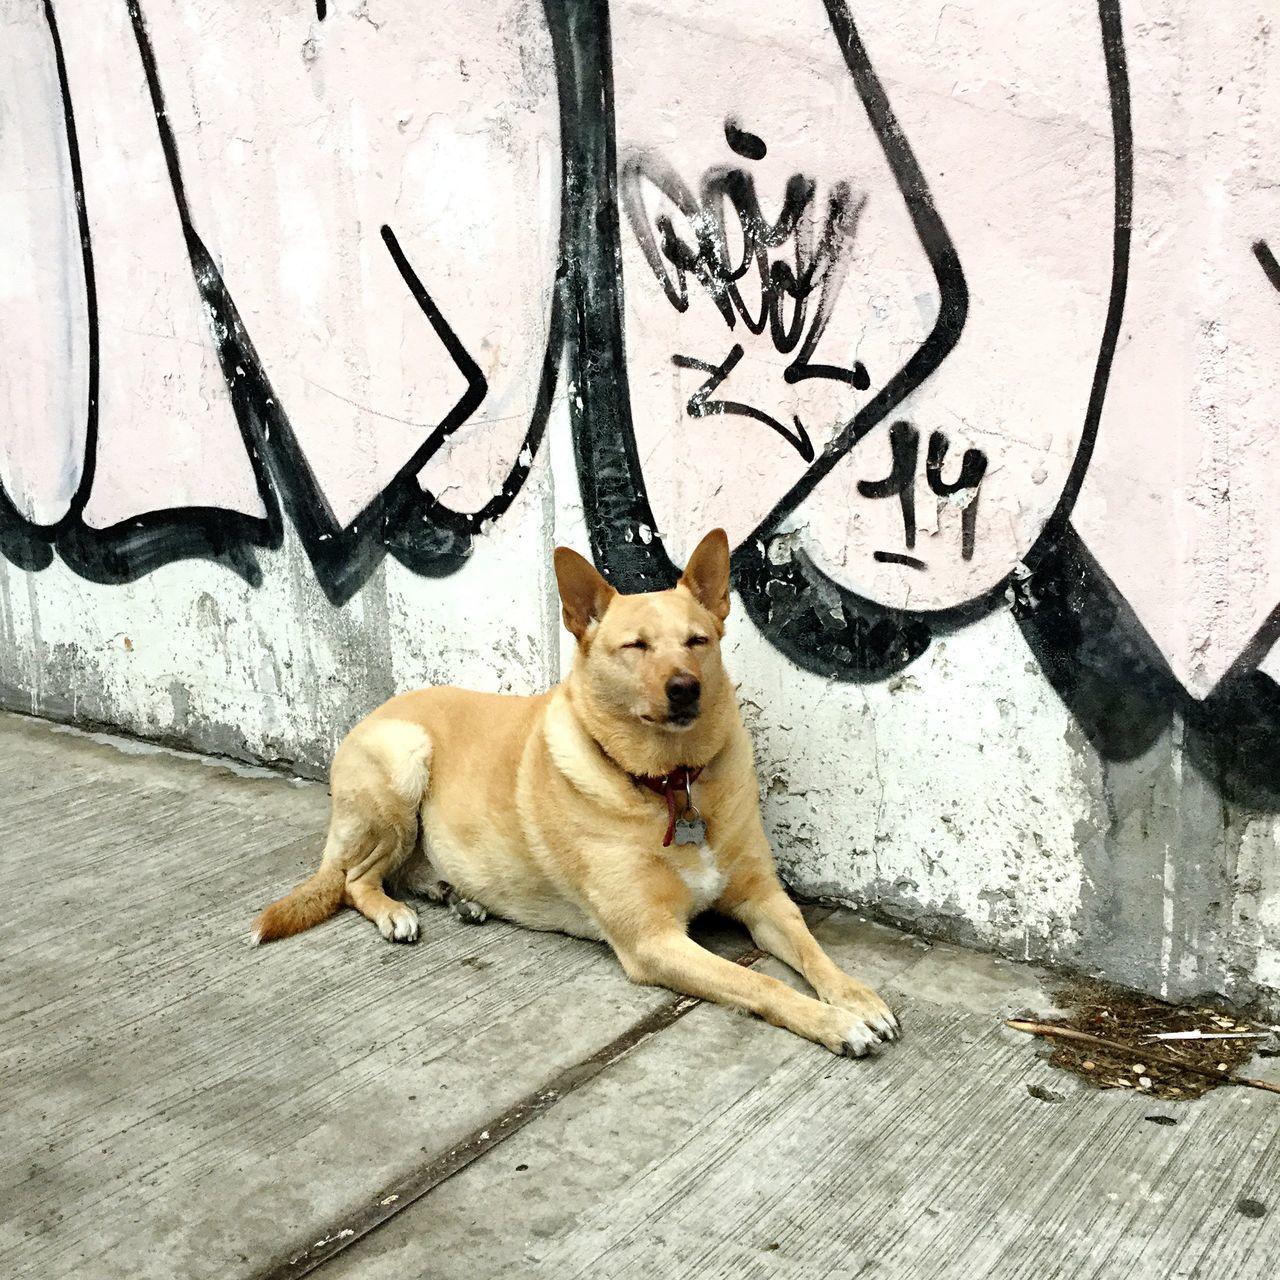 graffiti, one animal, pets, animal themes, text, outdoors, dog, sitting, domestic animals, mammal, sidewalk, day, relaxation, no people, portrait